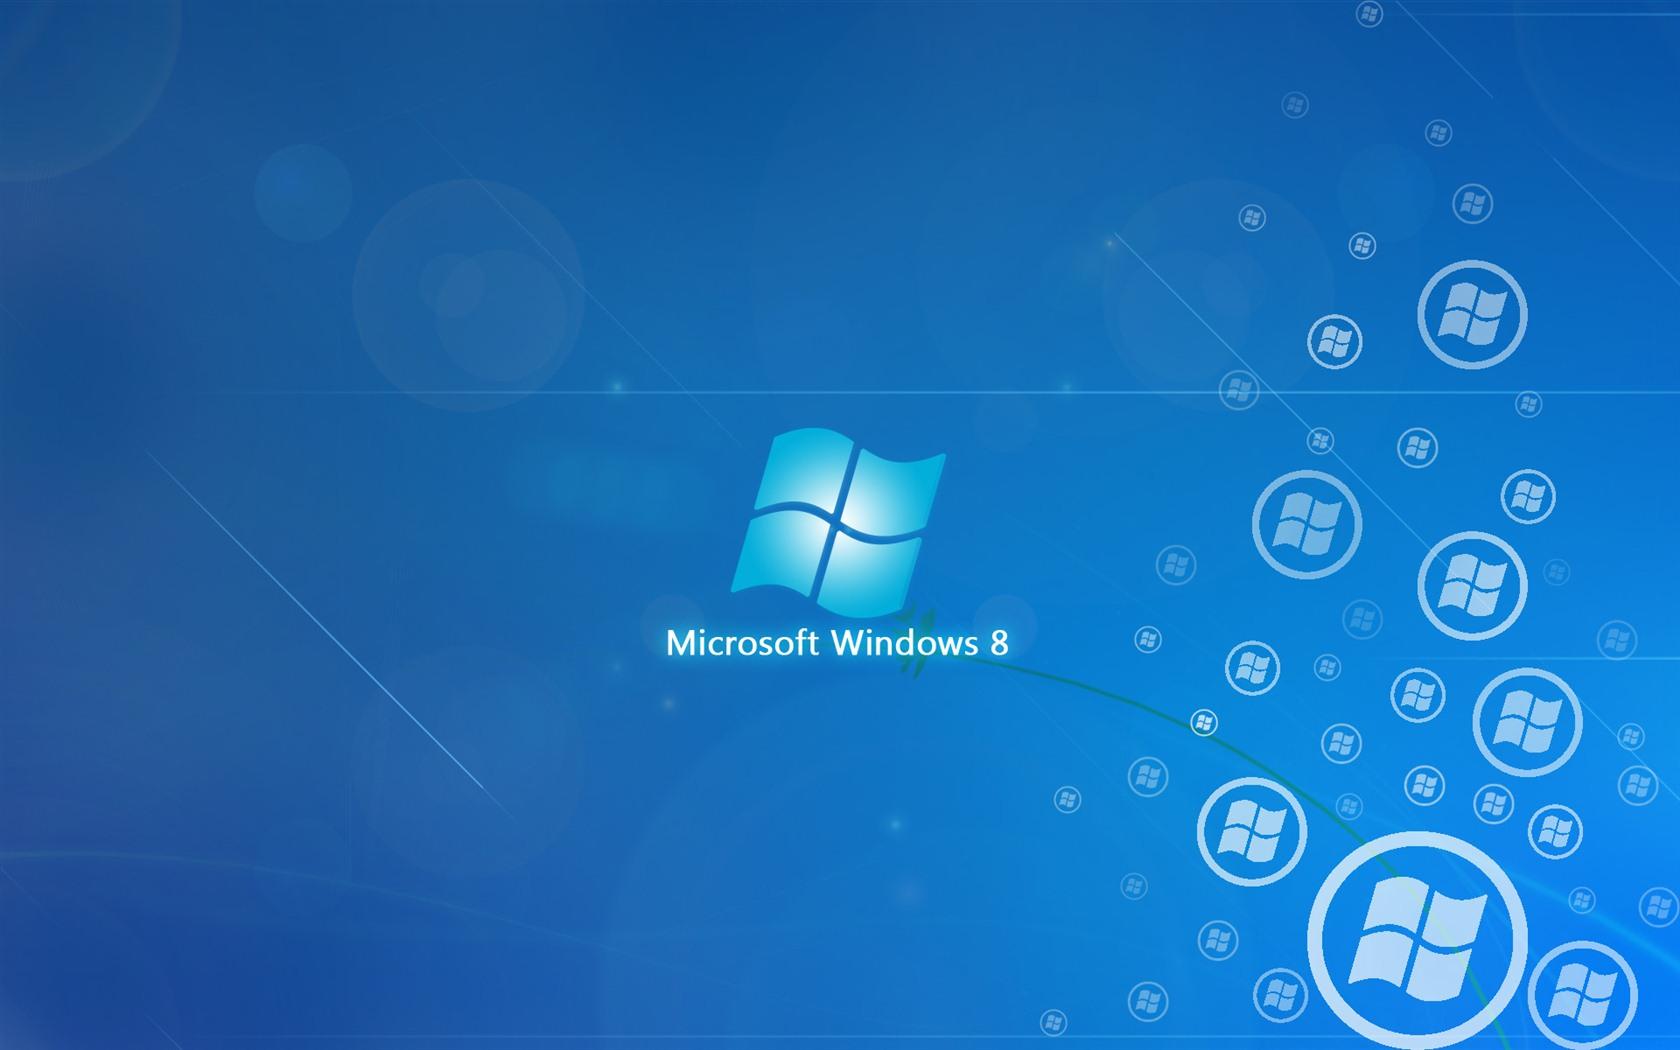 Windowsの8テーマの壁紙(2) #18 - 1680x1050.